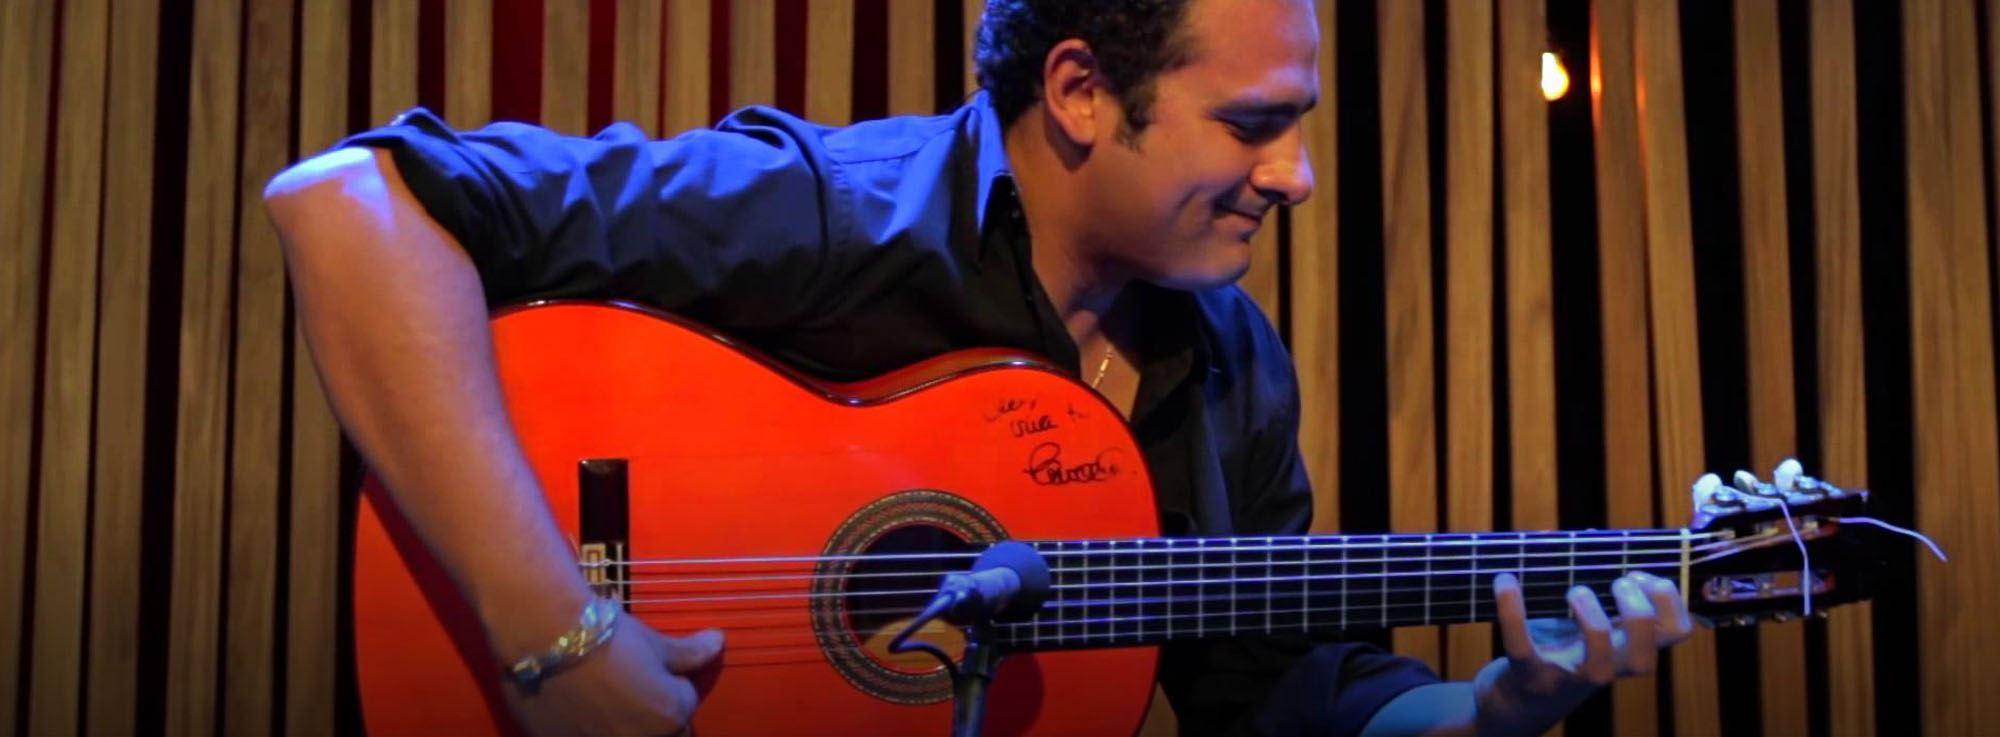 Taranto: Diego del Morao - Compagnia flamenco